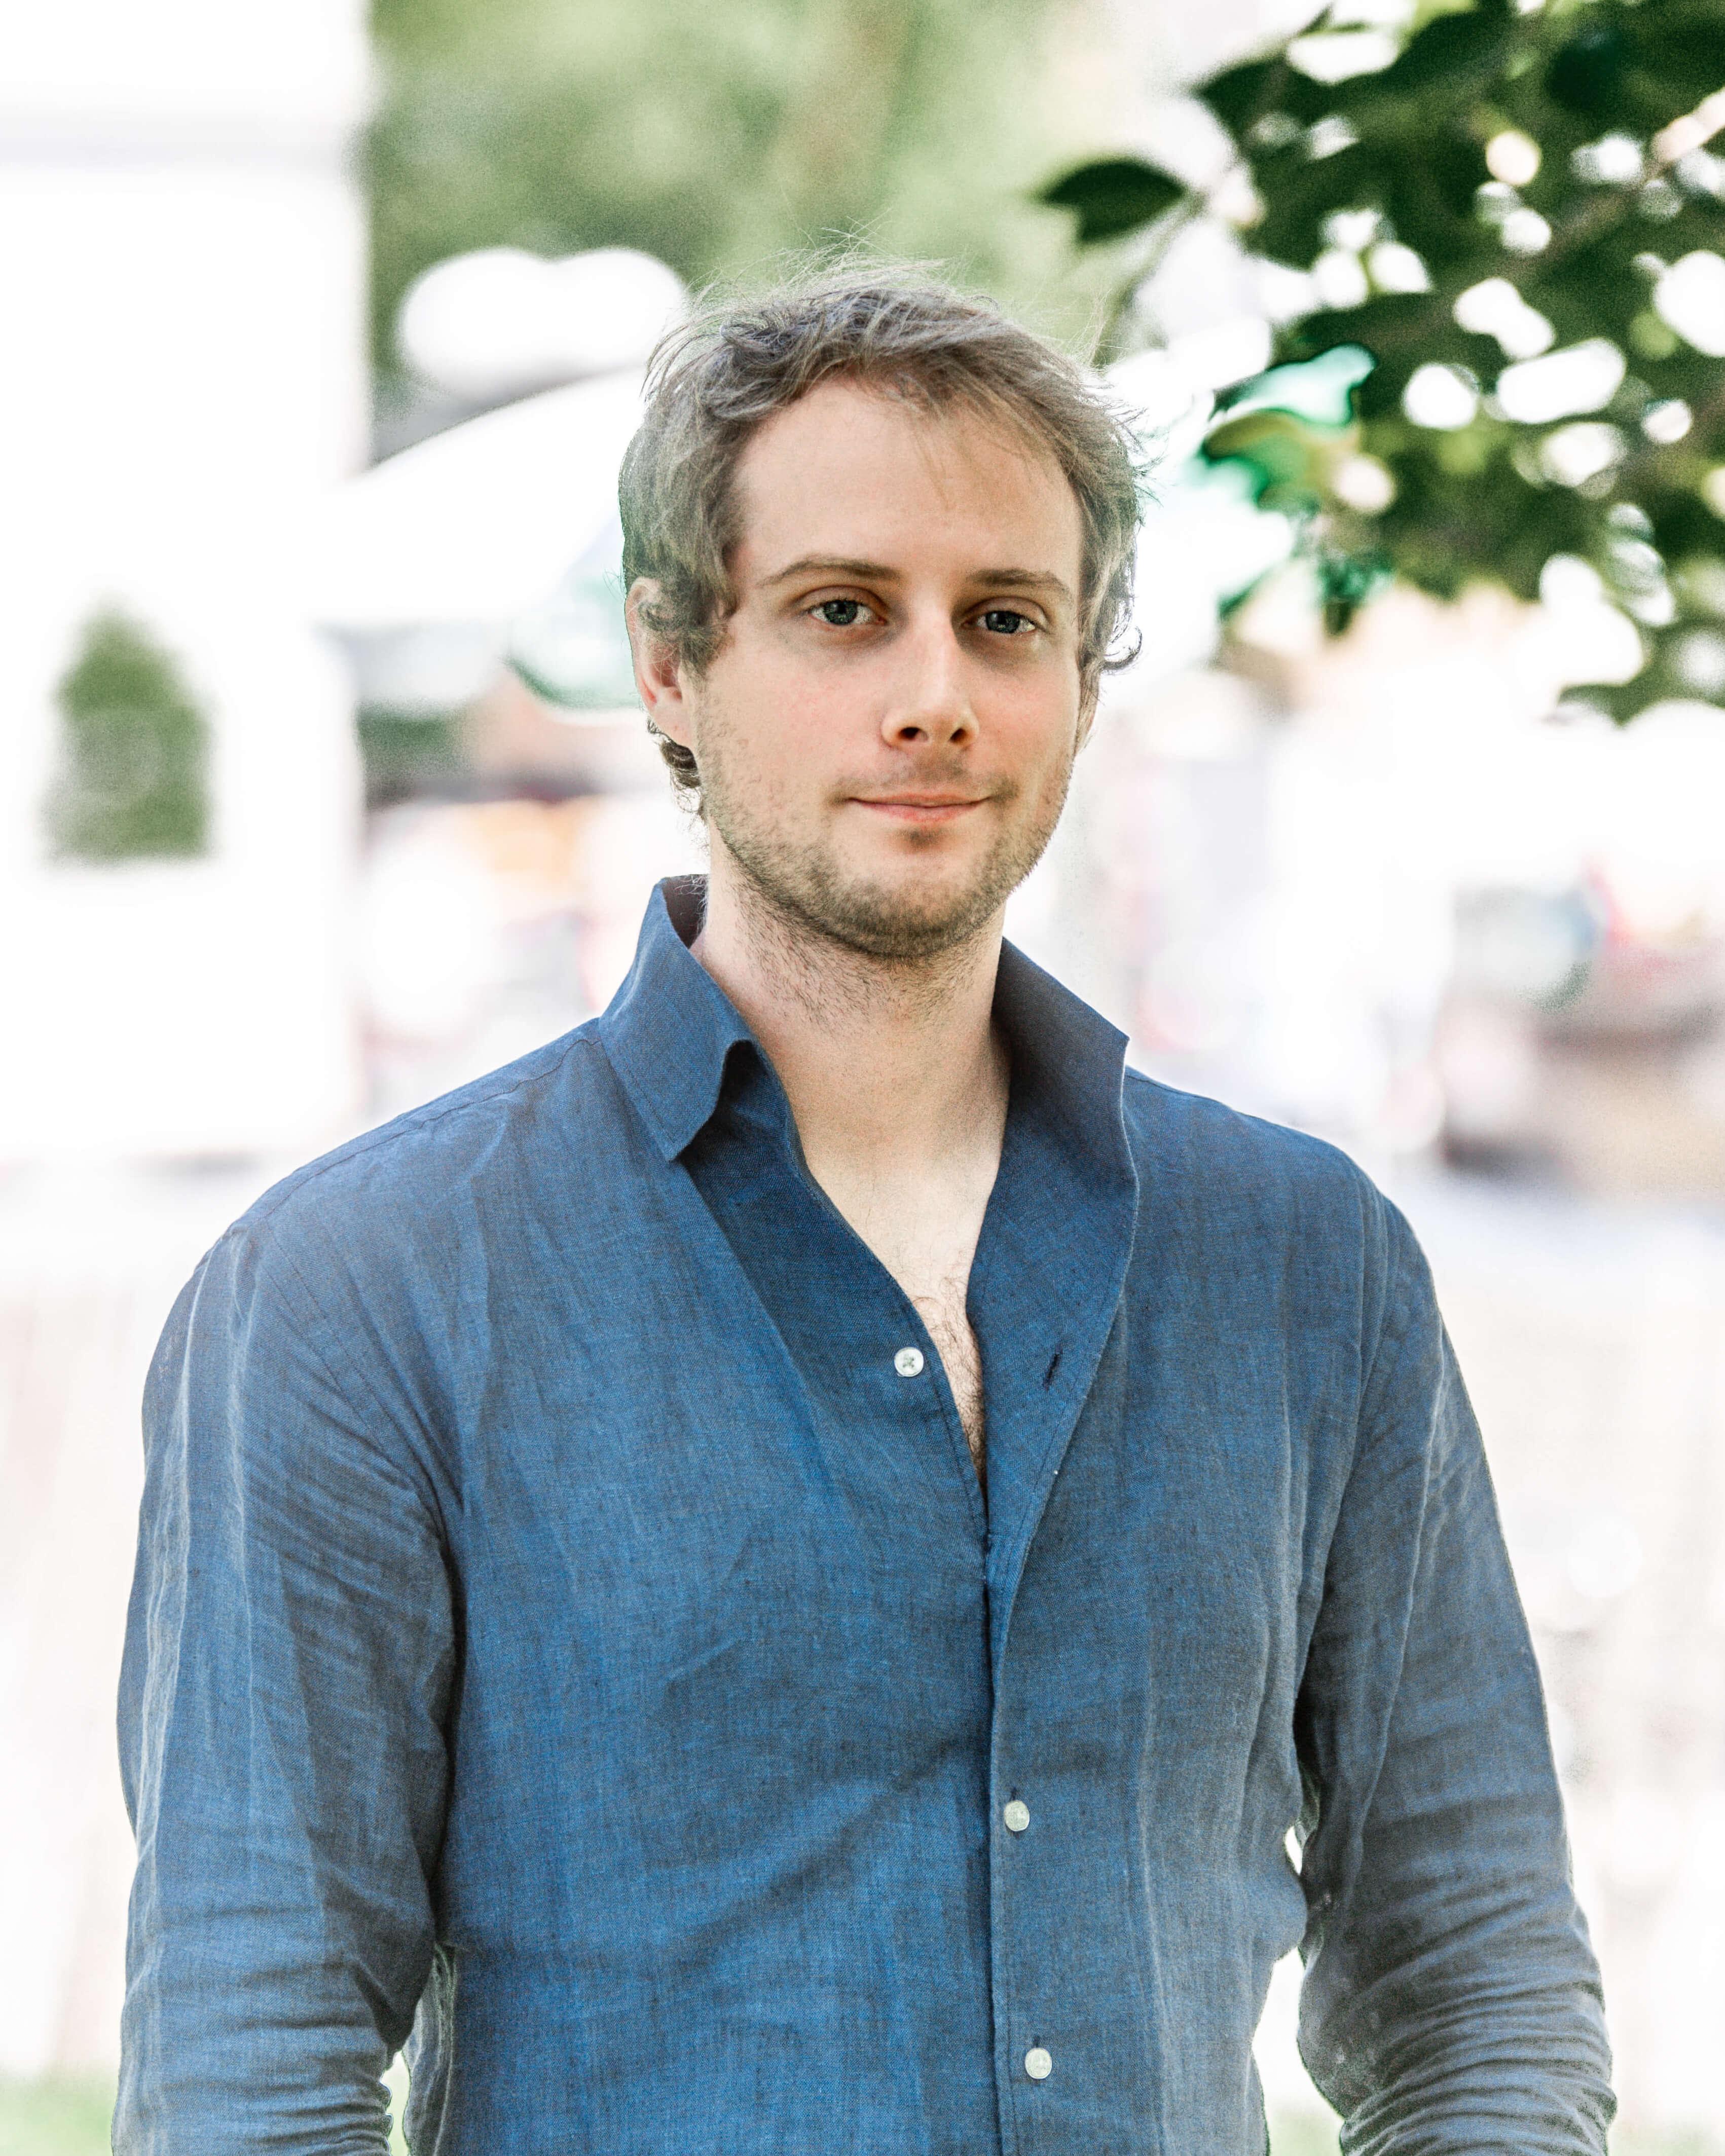 Justin Knutson